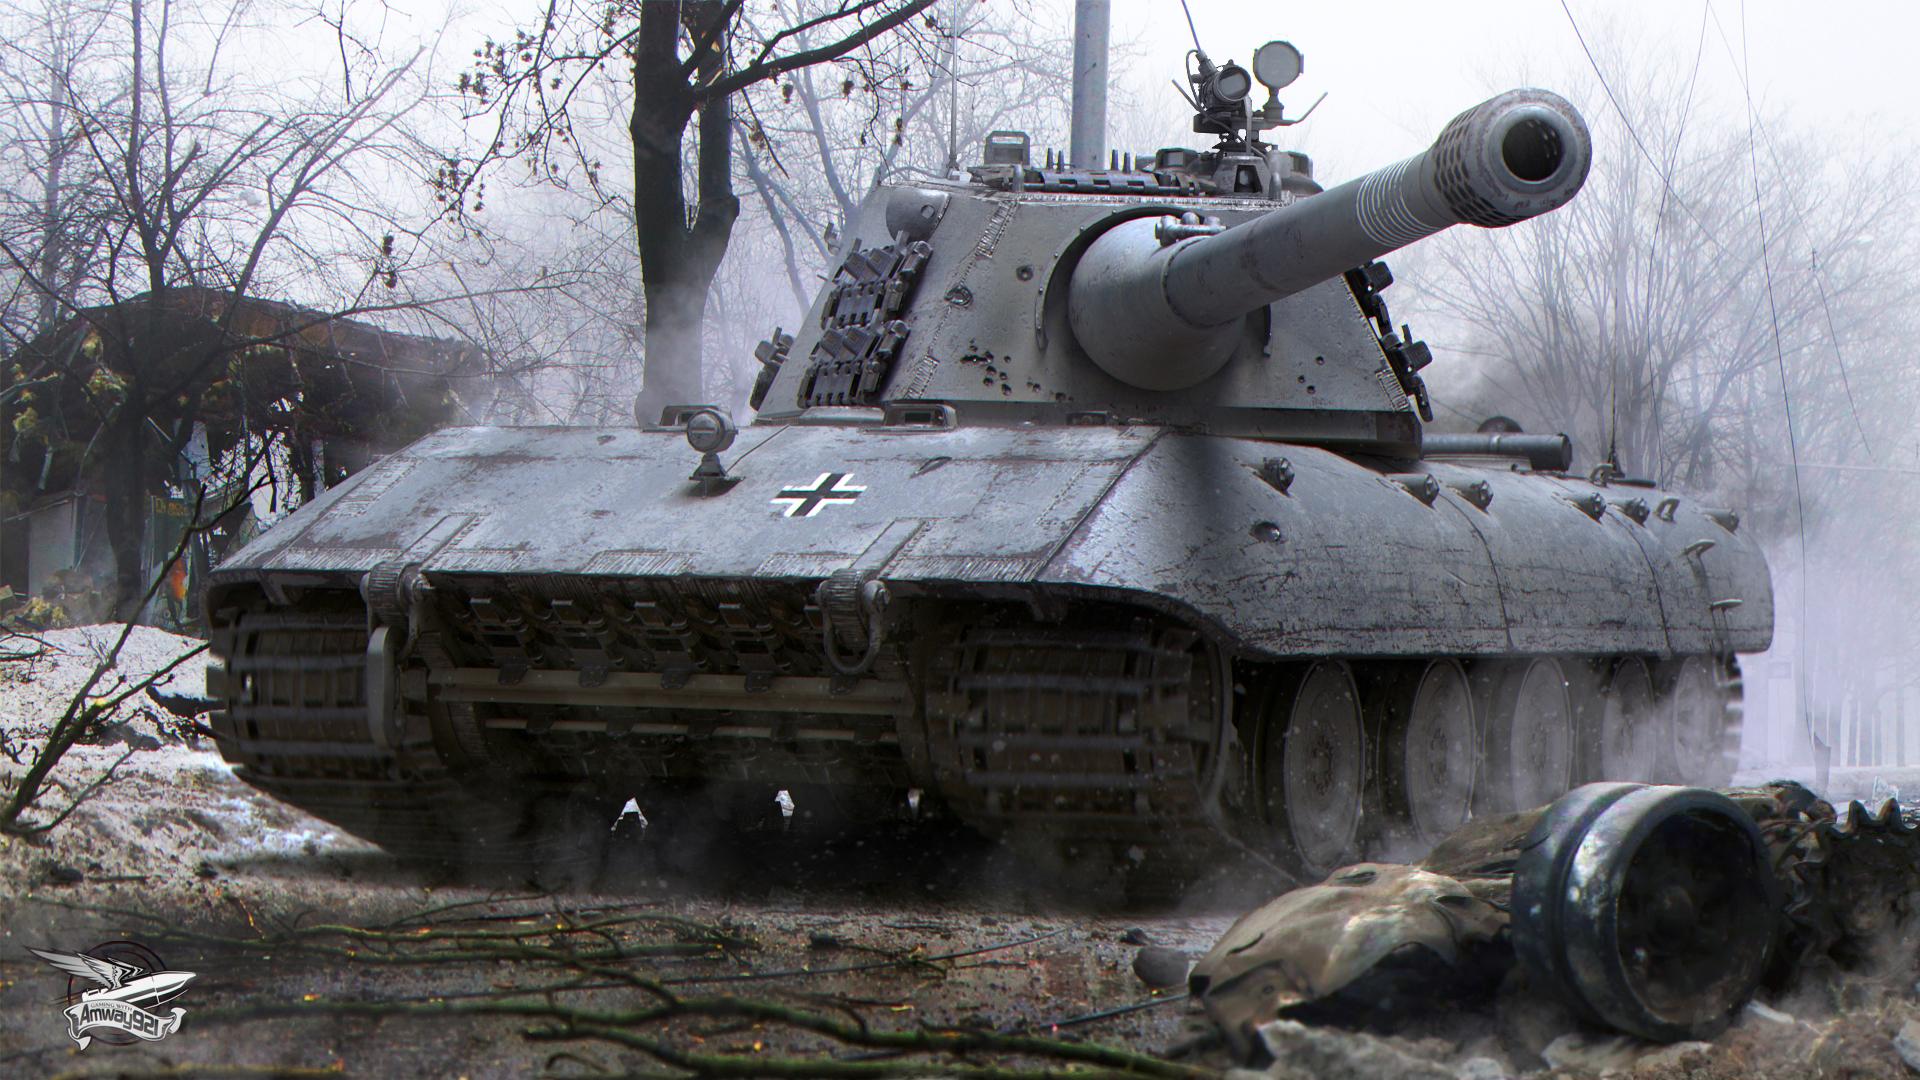 Waffentrager auf e 100jpg не добавлены